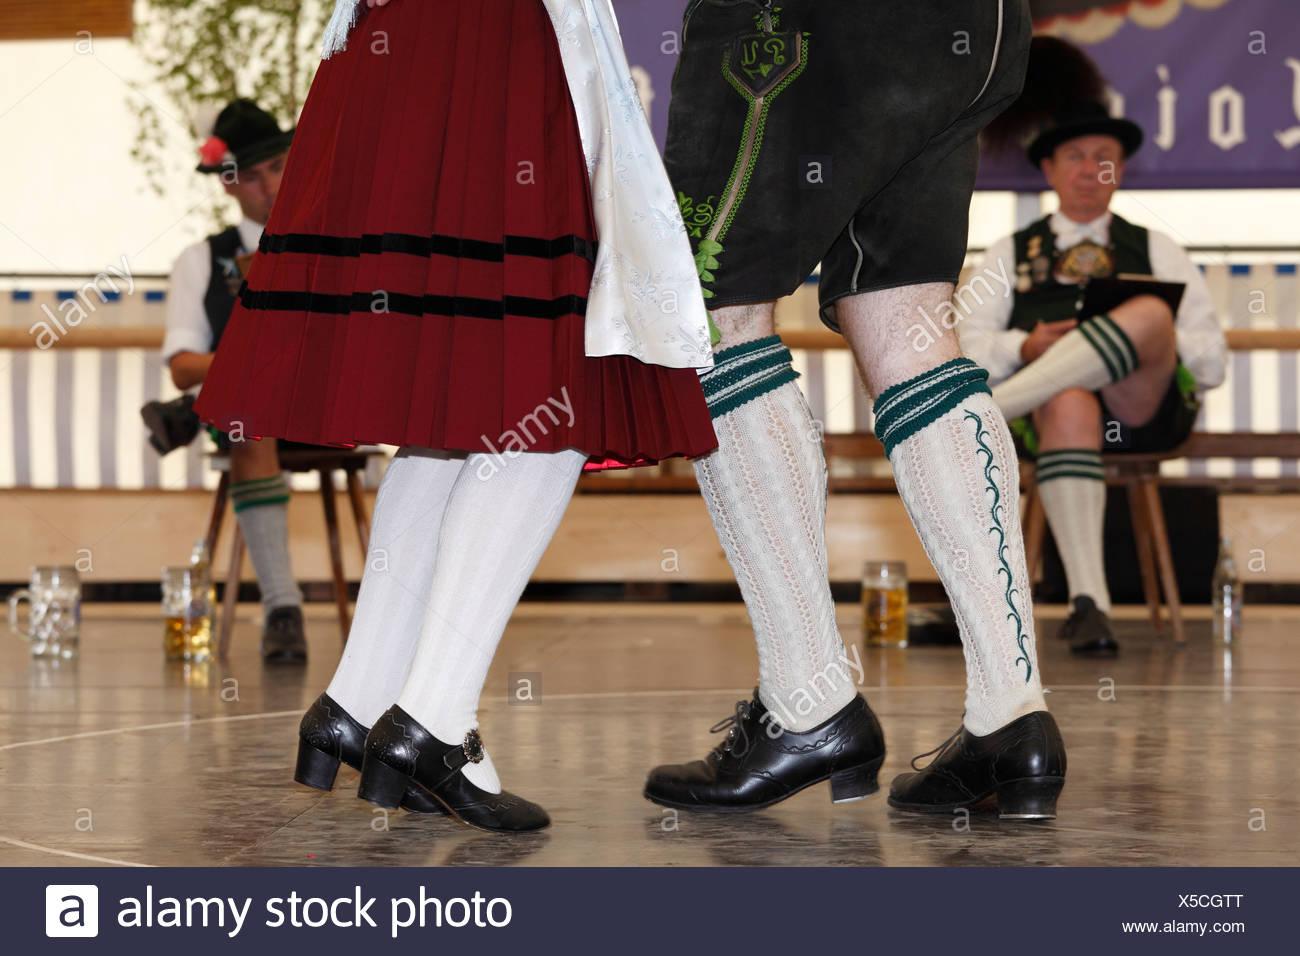 Schuhplattler, bailarines de danza folklórica tradicional, 83 en Neufahrn cerca Egling Loisachgaufest, Alta Baviera, Baviera, Alemania, Europa Foto de stock